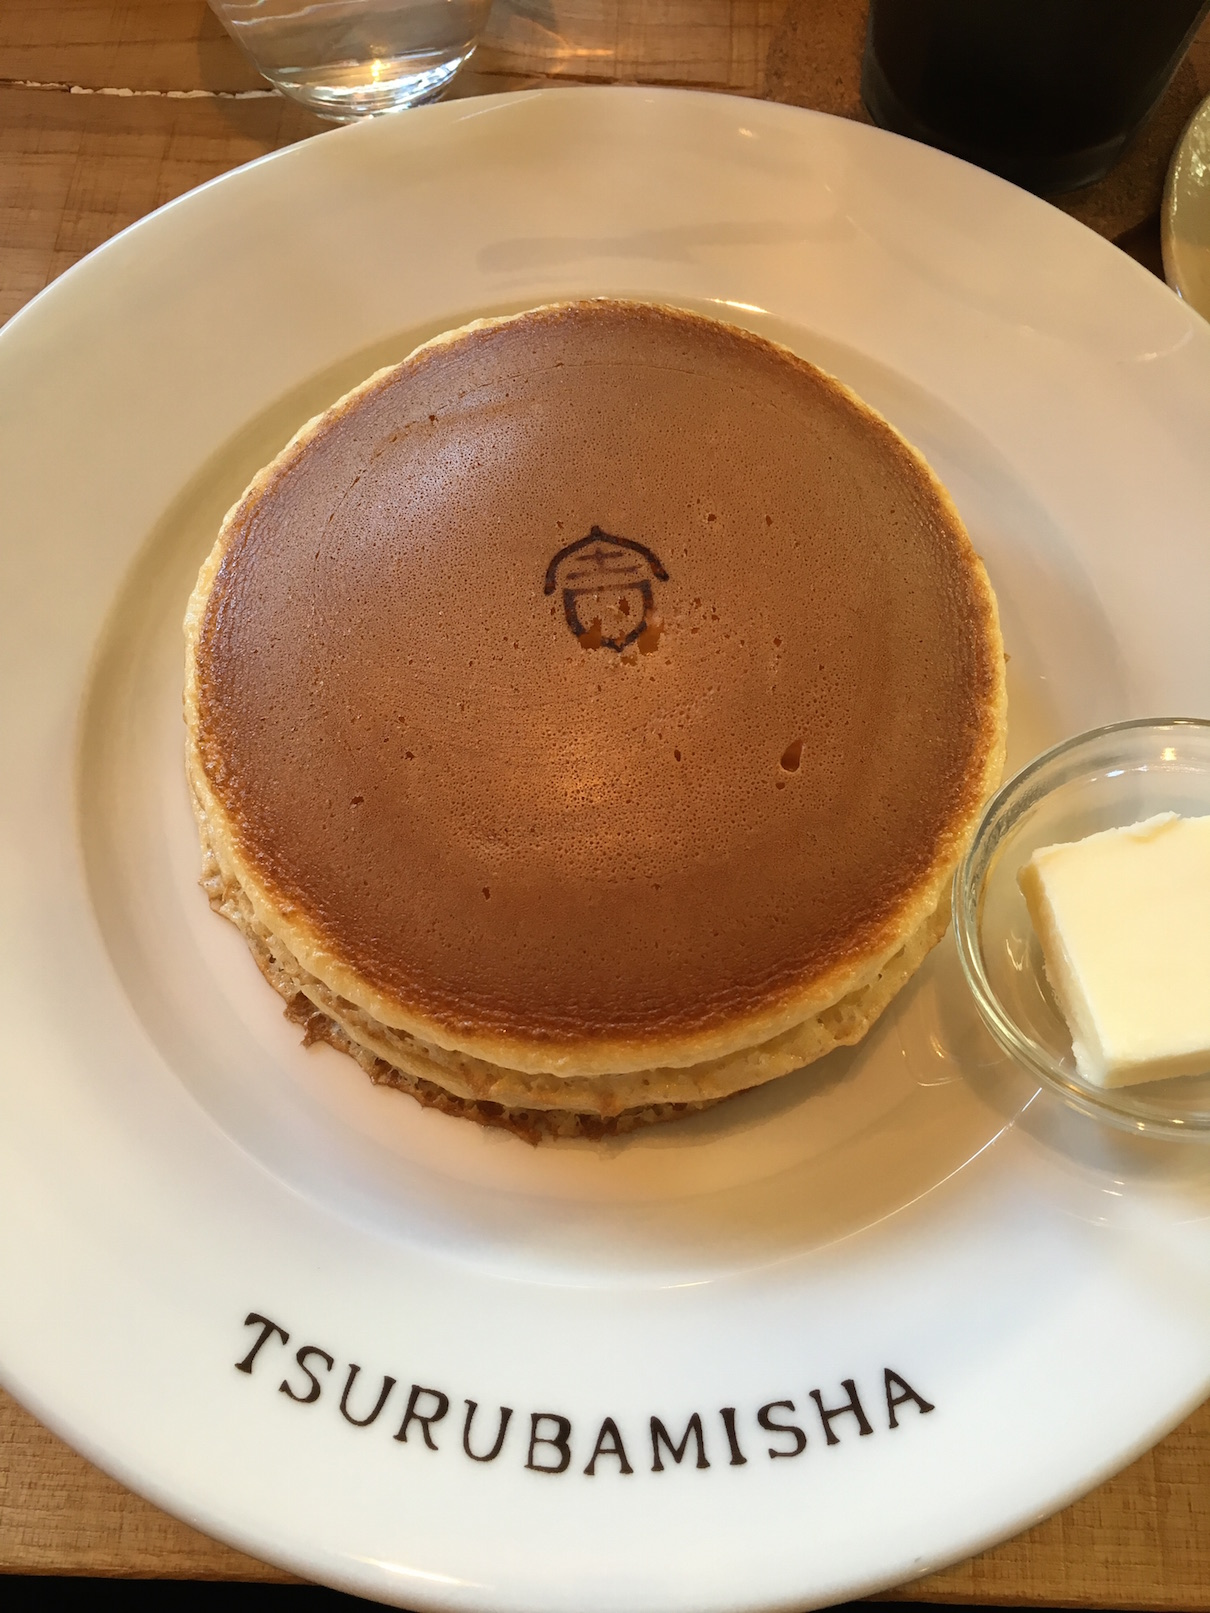 tsurubamisha_151018_2.jpg